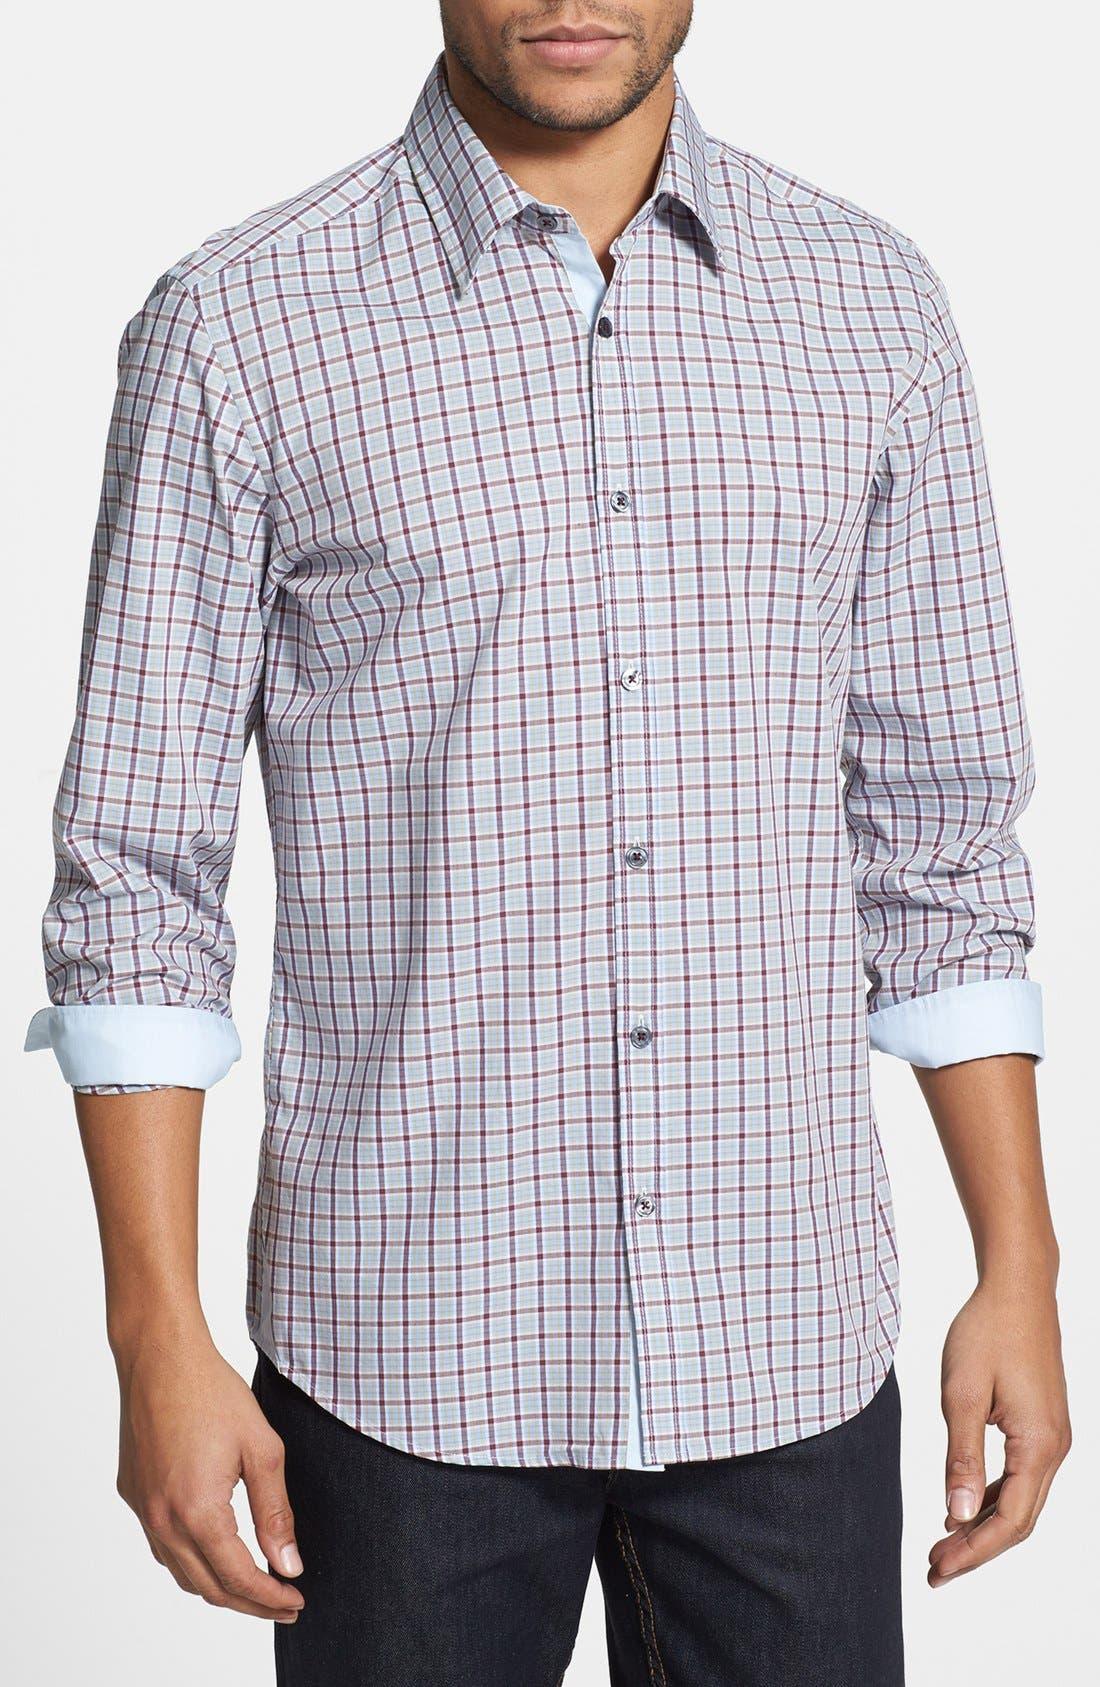 Alternate Image 1 Selected - BOSS HUGO BOSS 'Obert' Regular Fit Plaid Sport Shirt